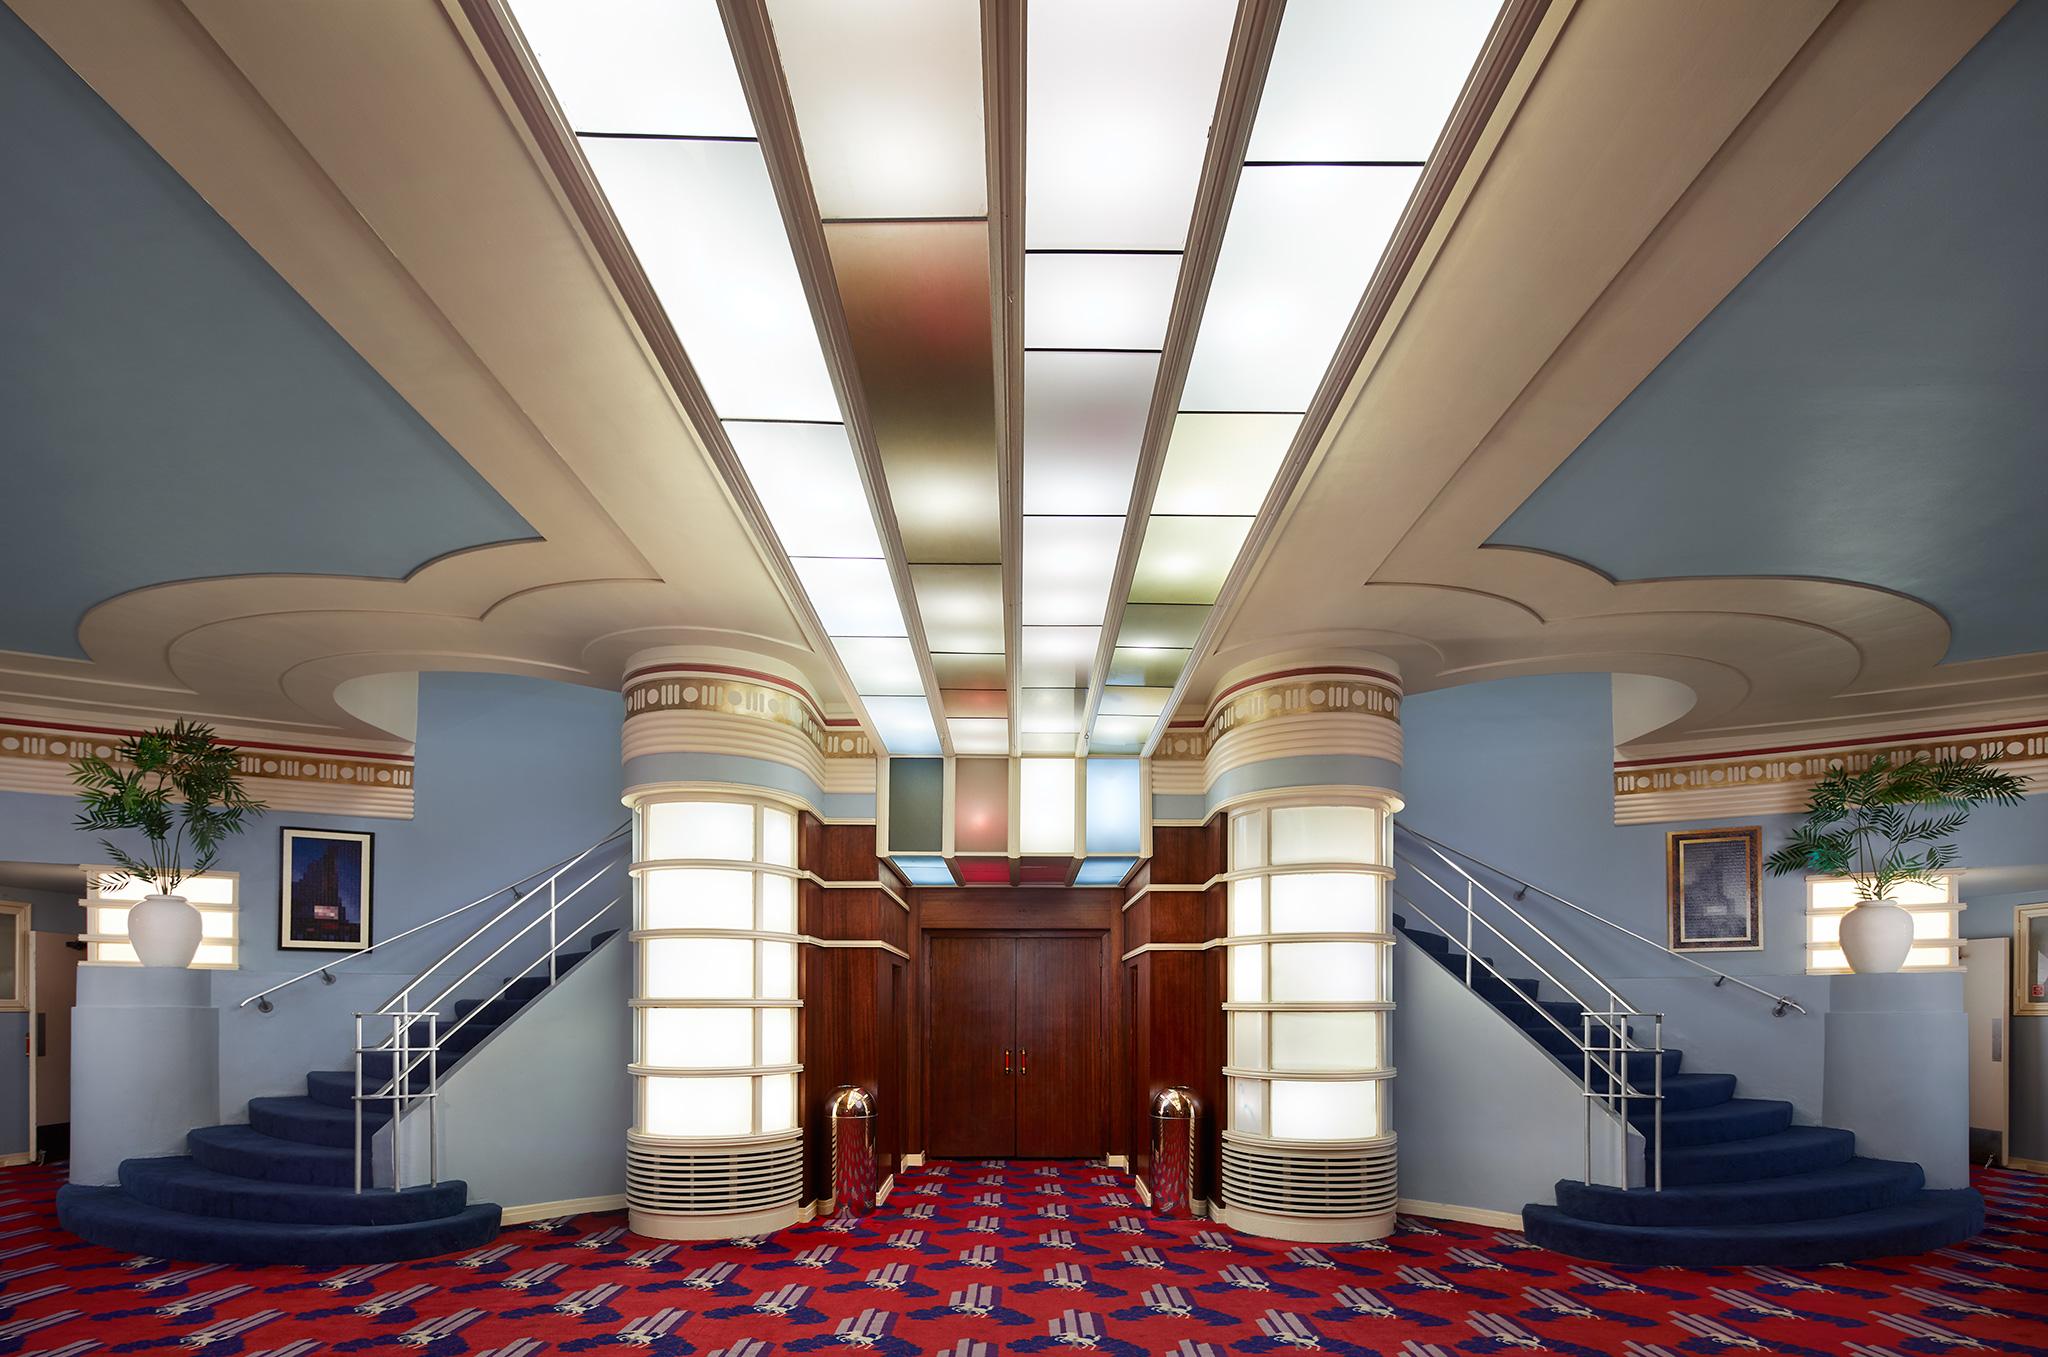 eureka-theatre-architecture-photographer-pacific-northwest.jpg